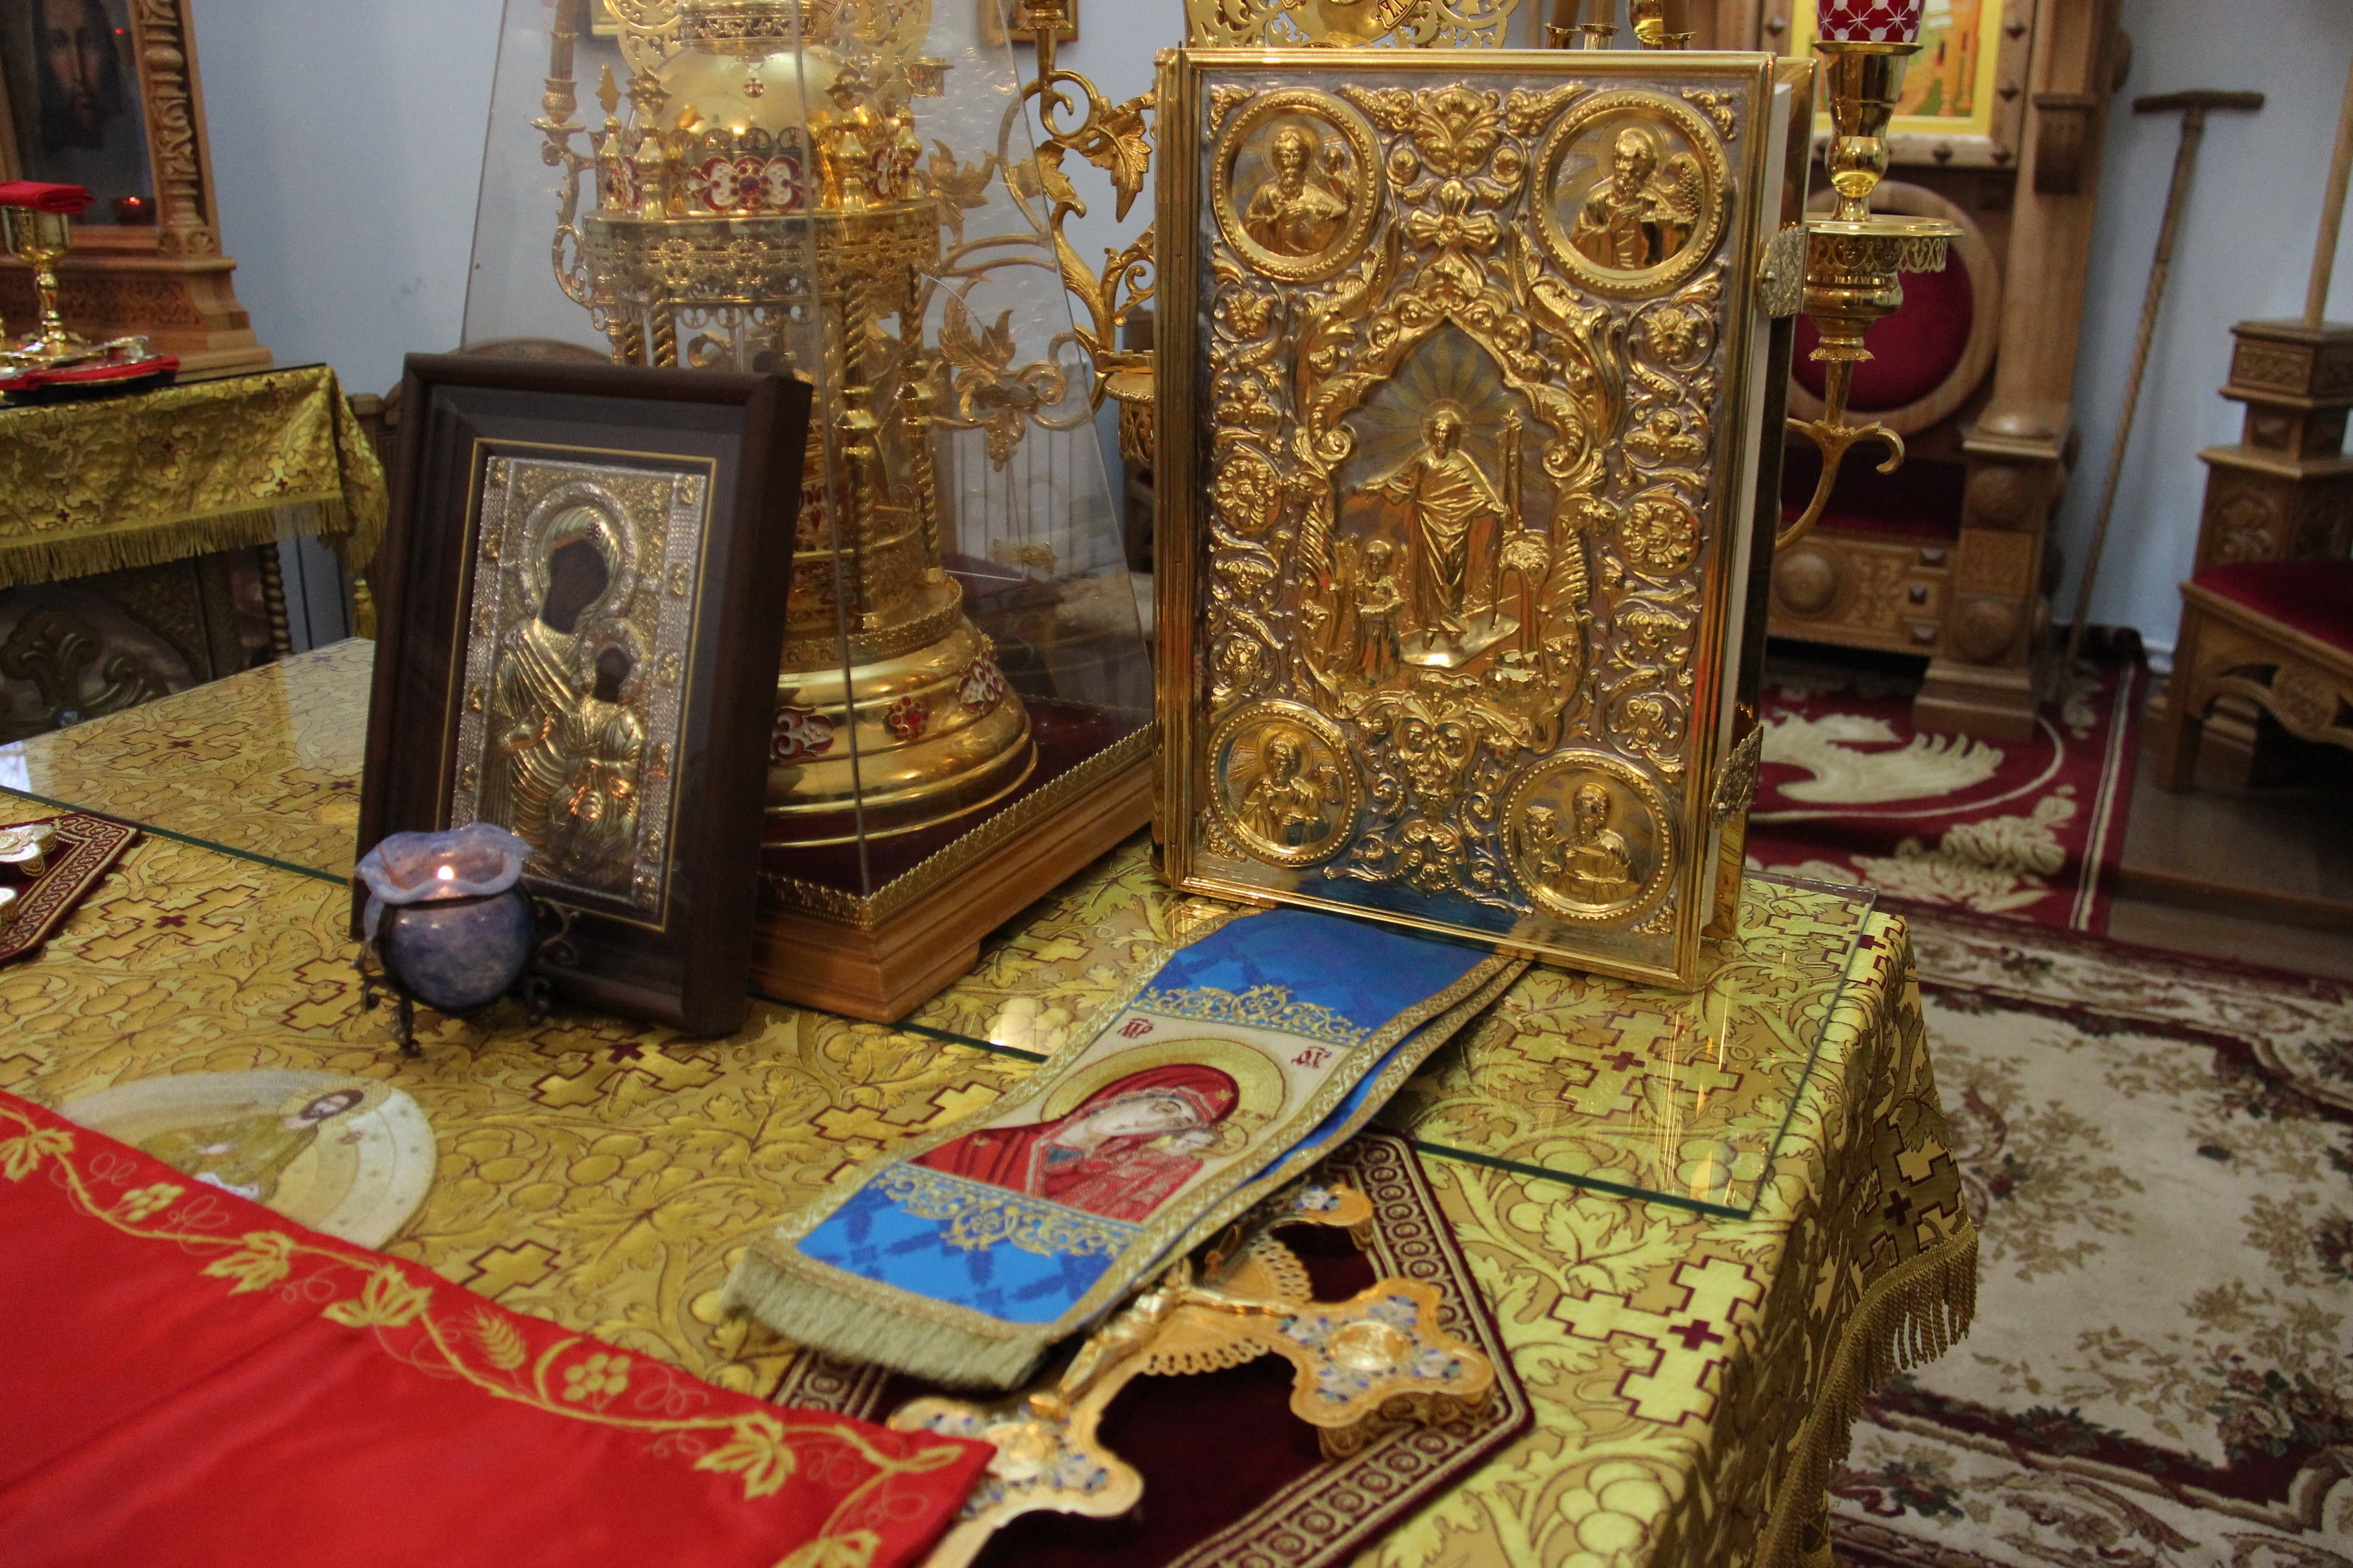 http://monuspen.ru/photoreports/342b84000453e5730cbd714d7faf133w.JPG